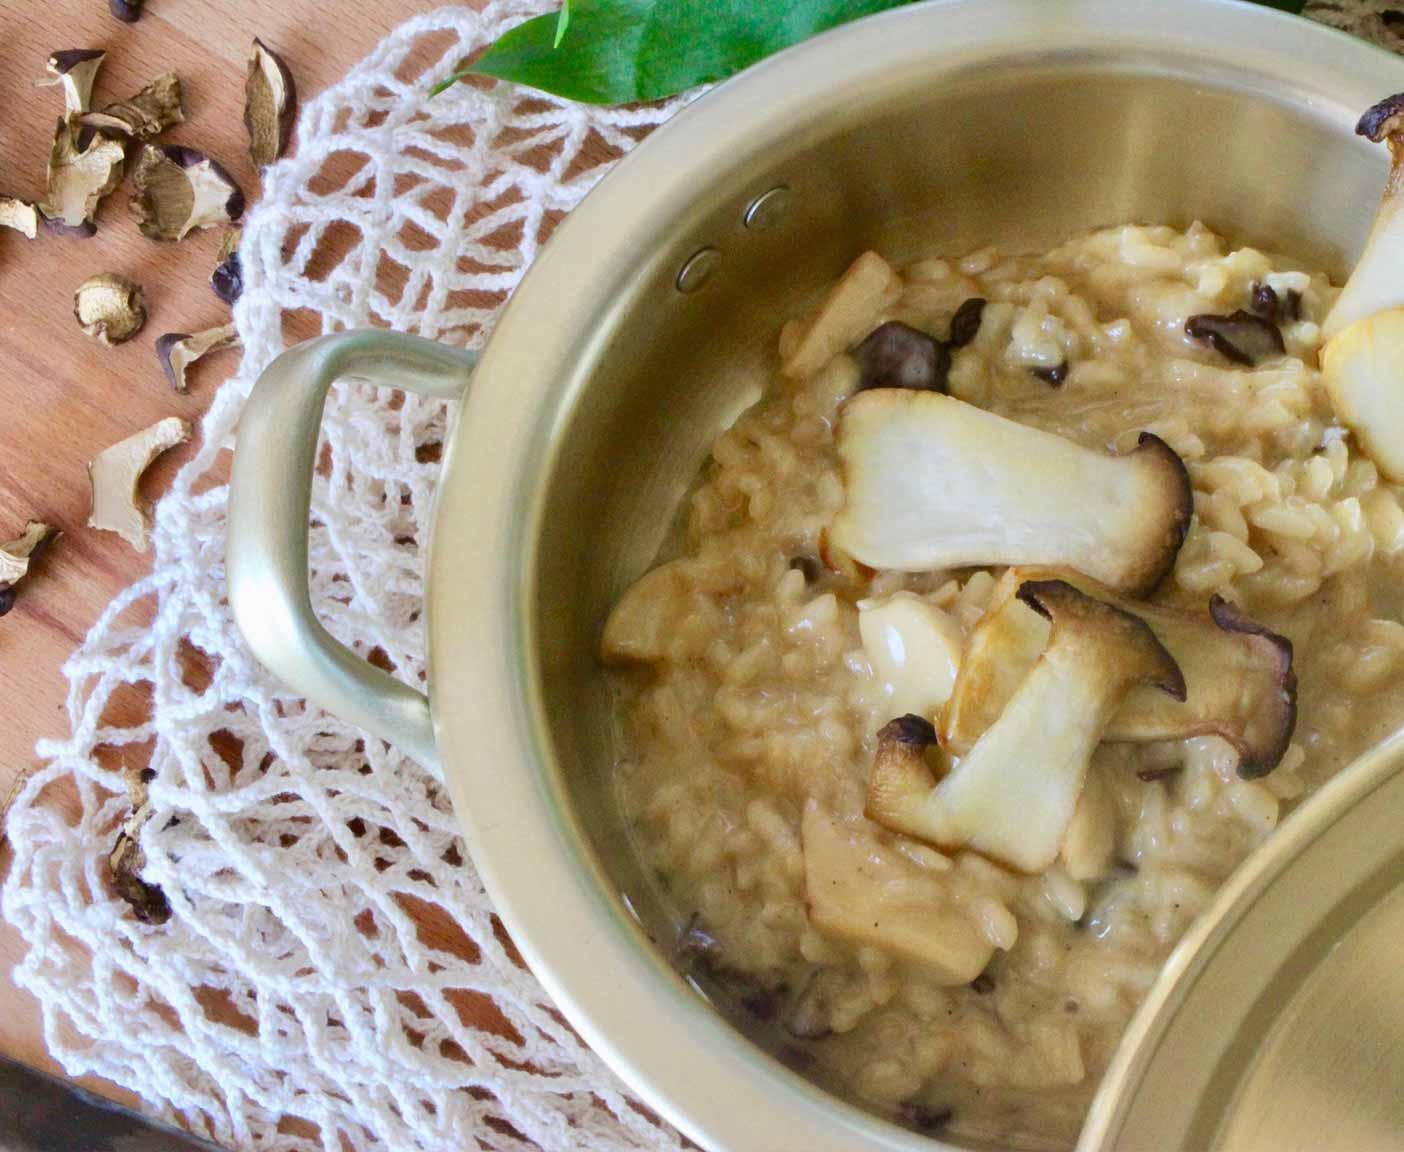 Risotto-Kartoffelsuppe-herbst-rezepte-einfach-vanlife-camping-kueche-fleisch-vegetarisch